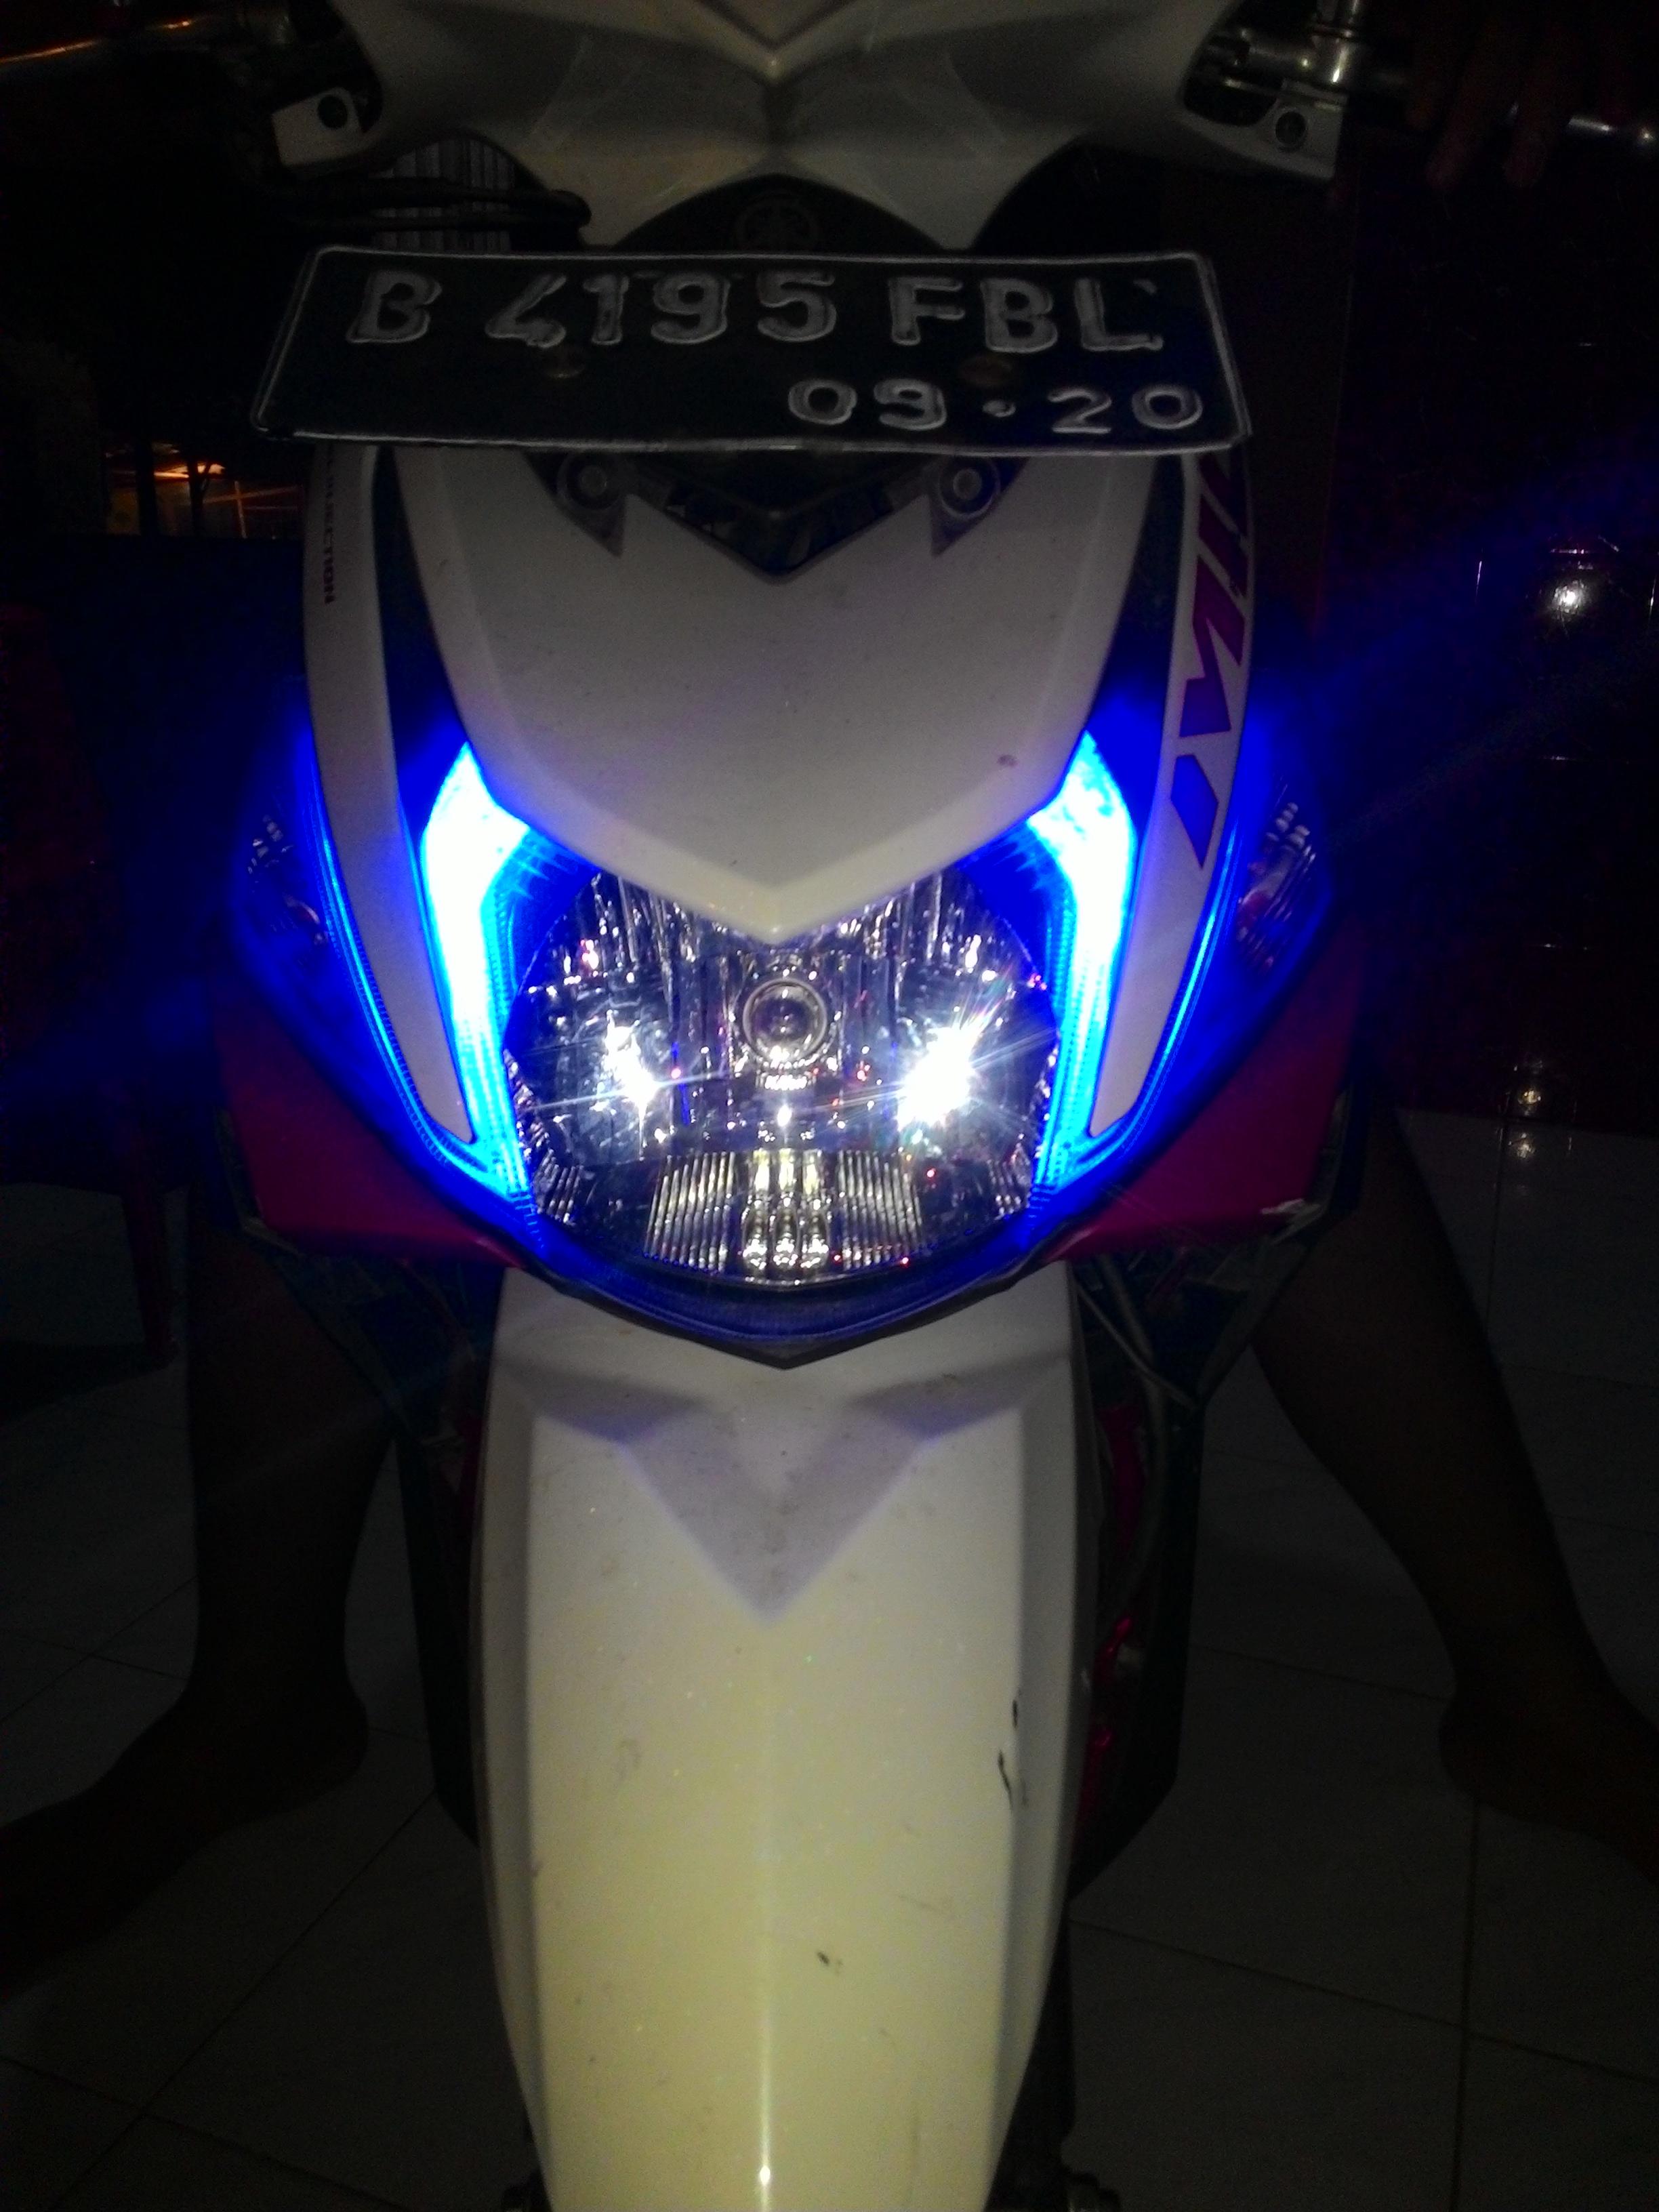 Mudahnya Seting Jarak Pijar Lampu Yamaha Mio M3 125 Cuma Modal